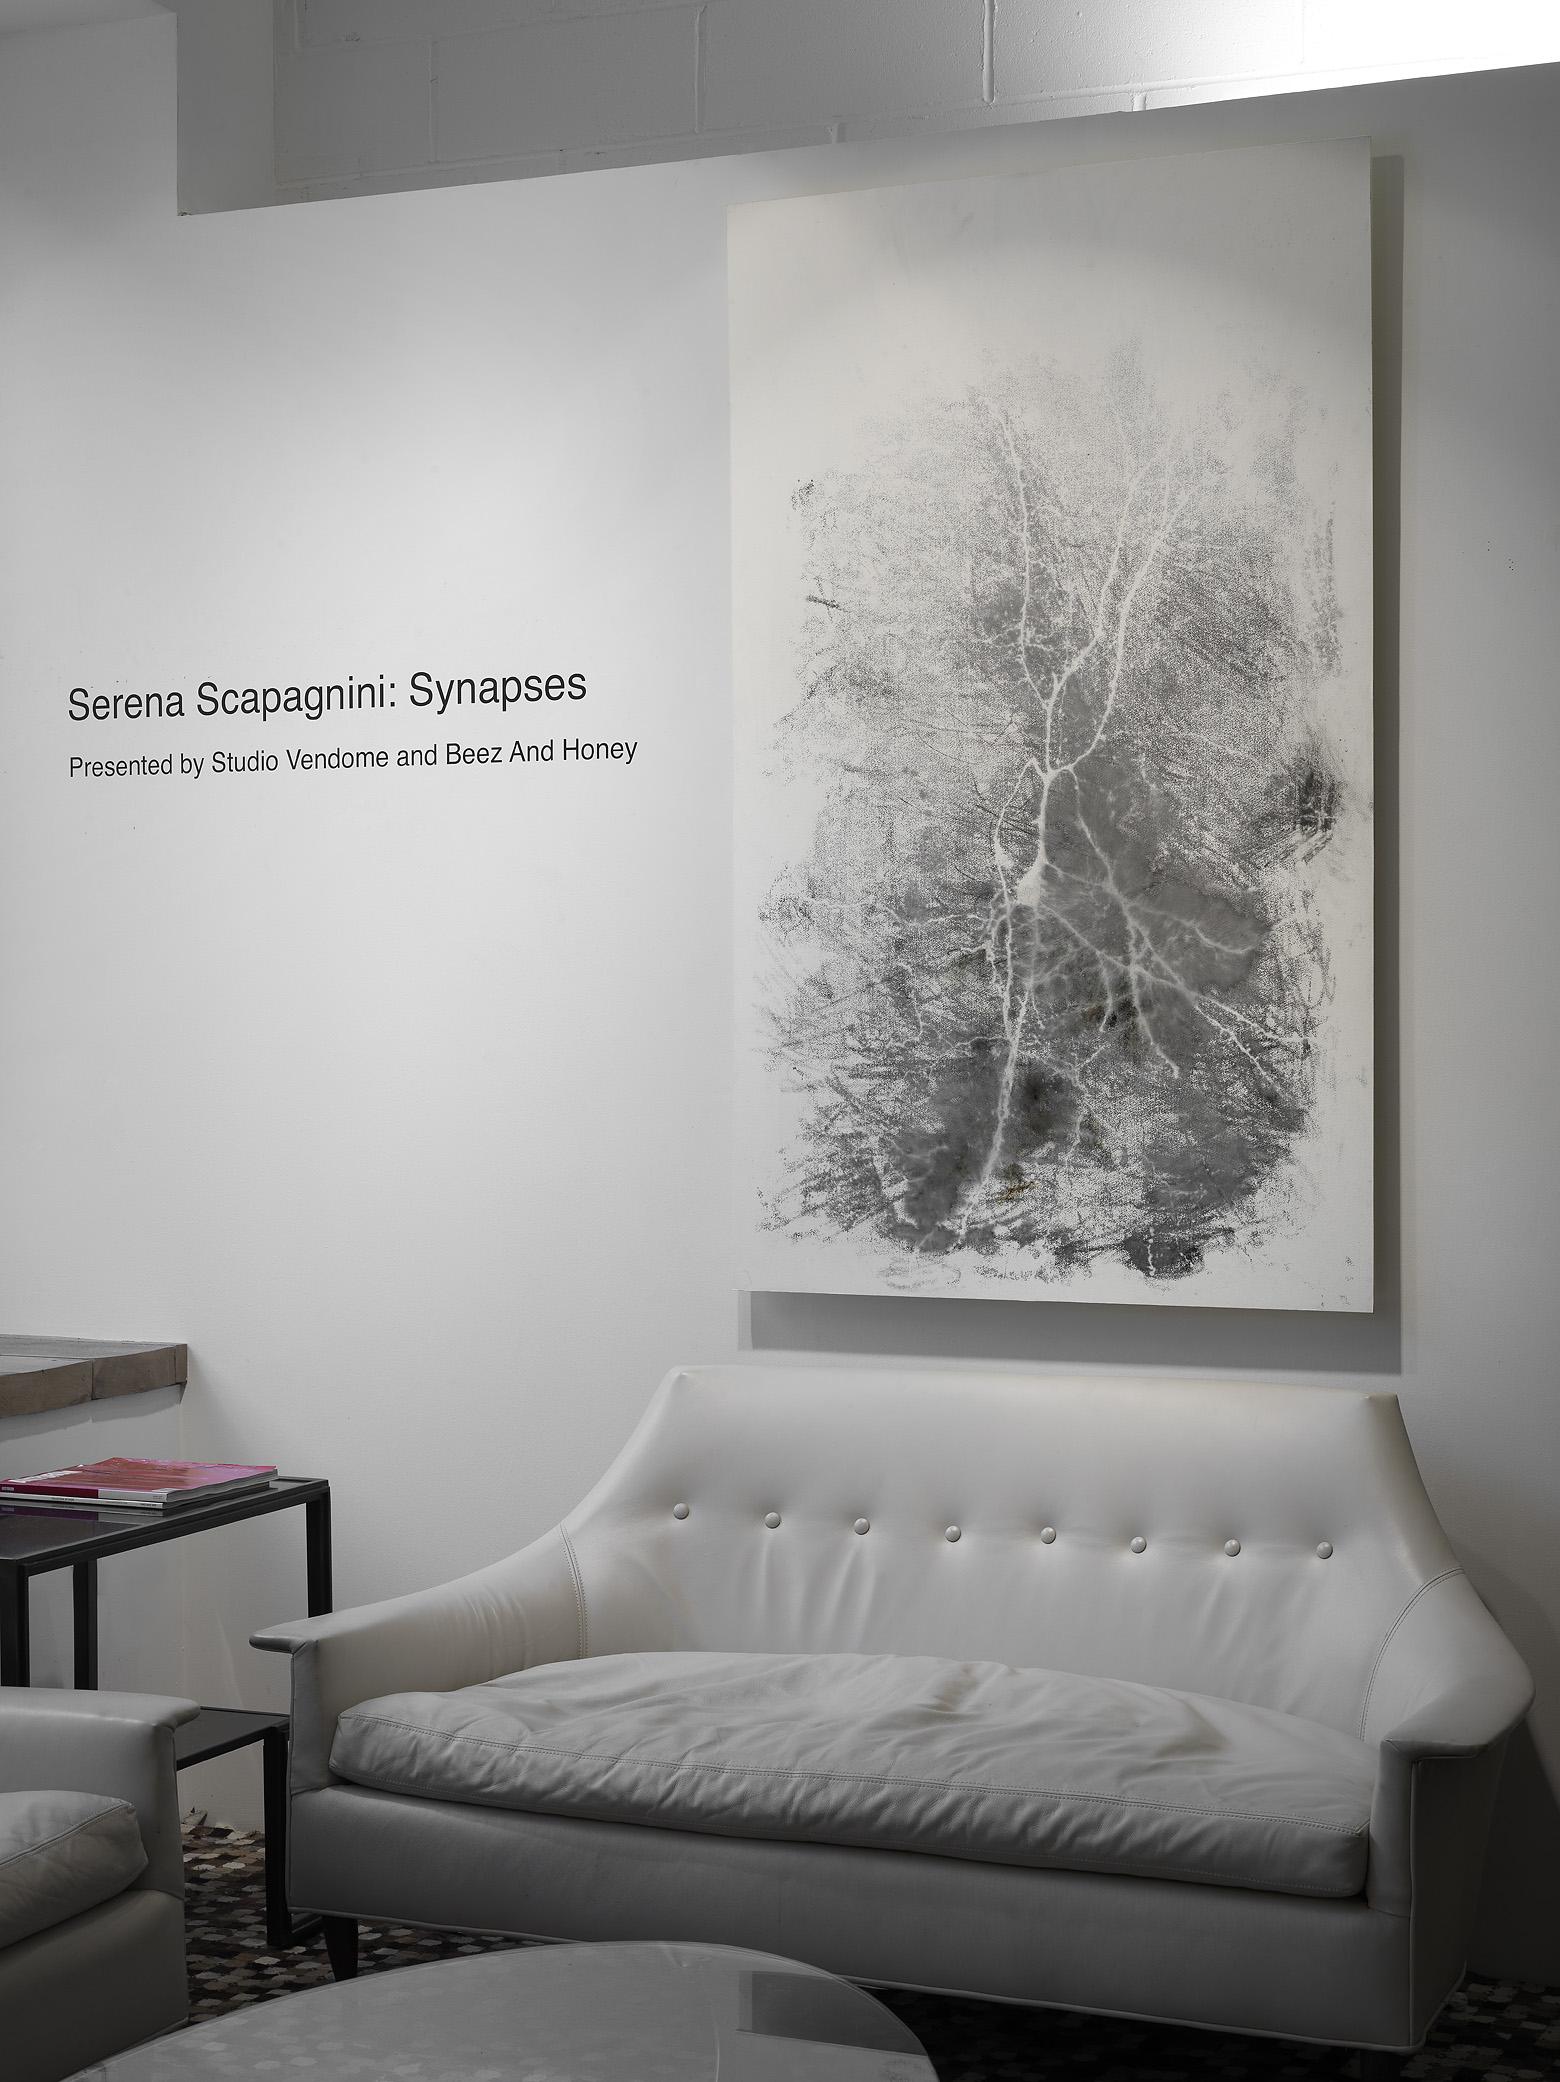 Ph:  Serena Scapagnini